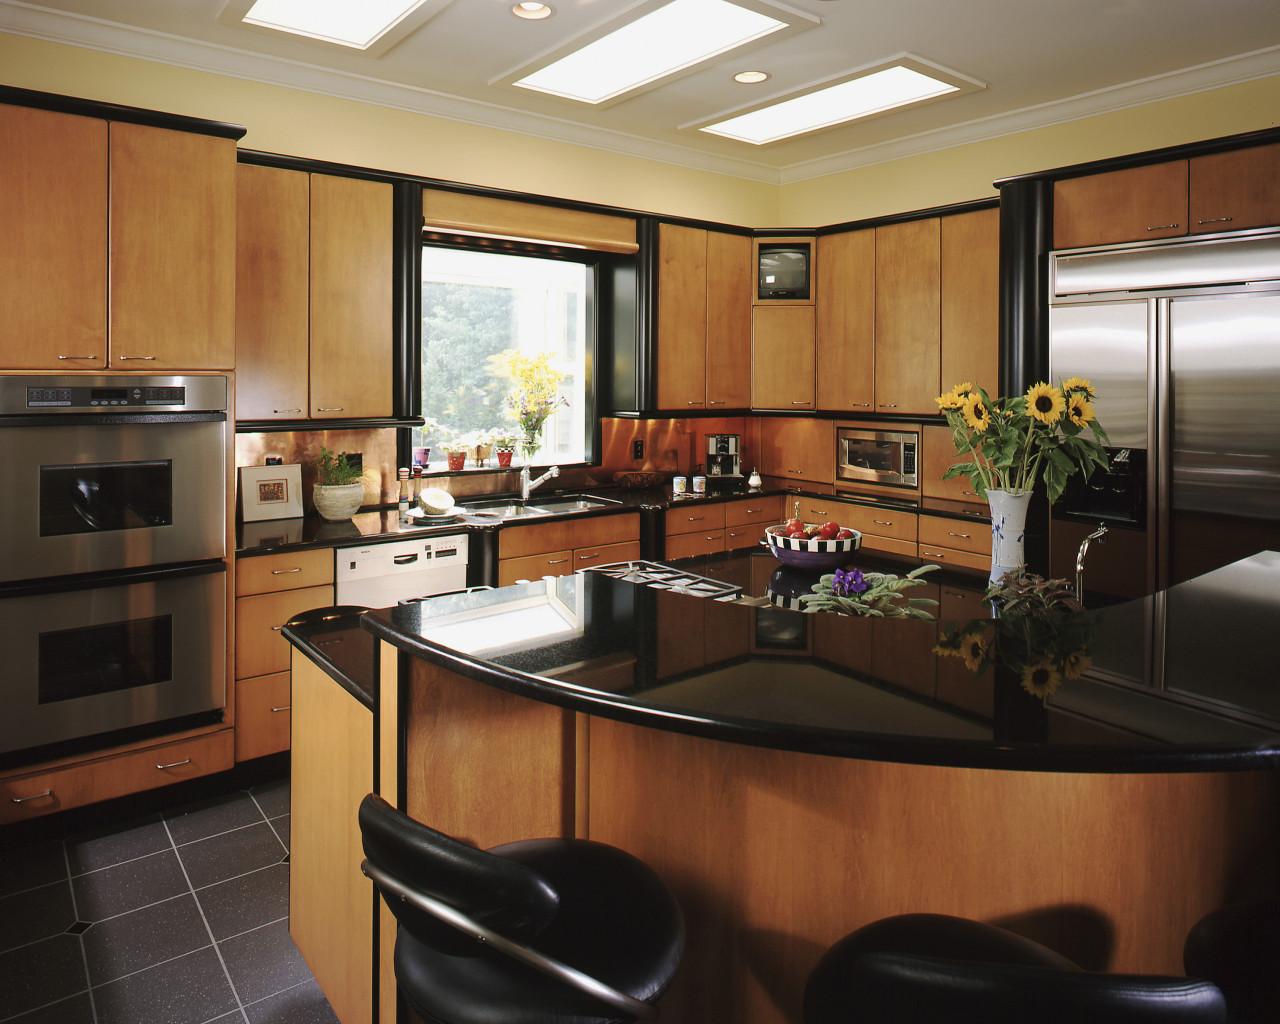 Brown timber kitchen - laminate cabinetry, countertop, interior design, kitchen, real estate, room, black, brown